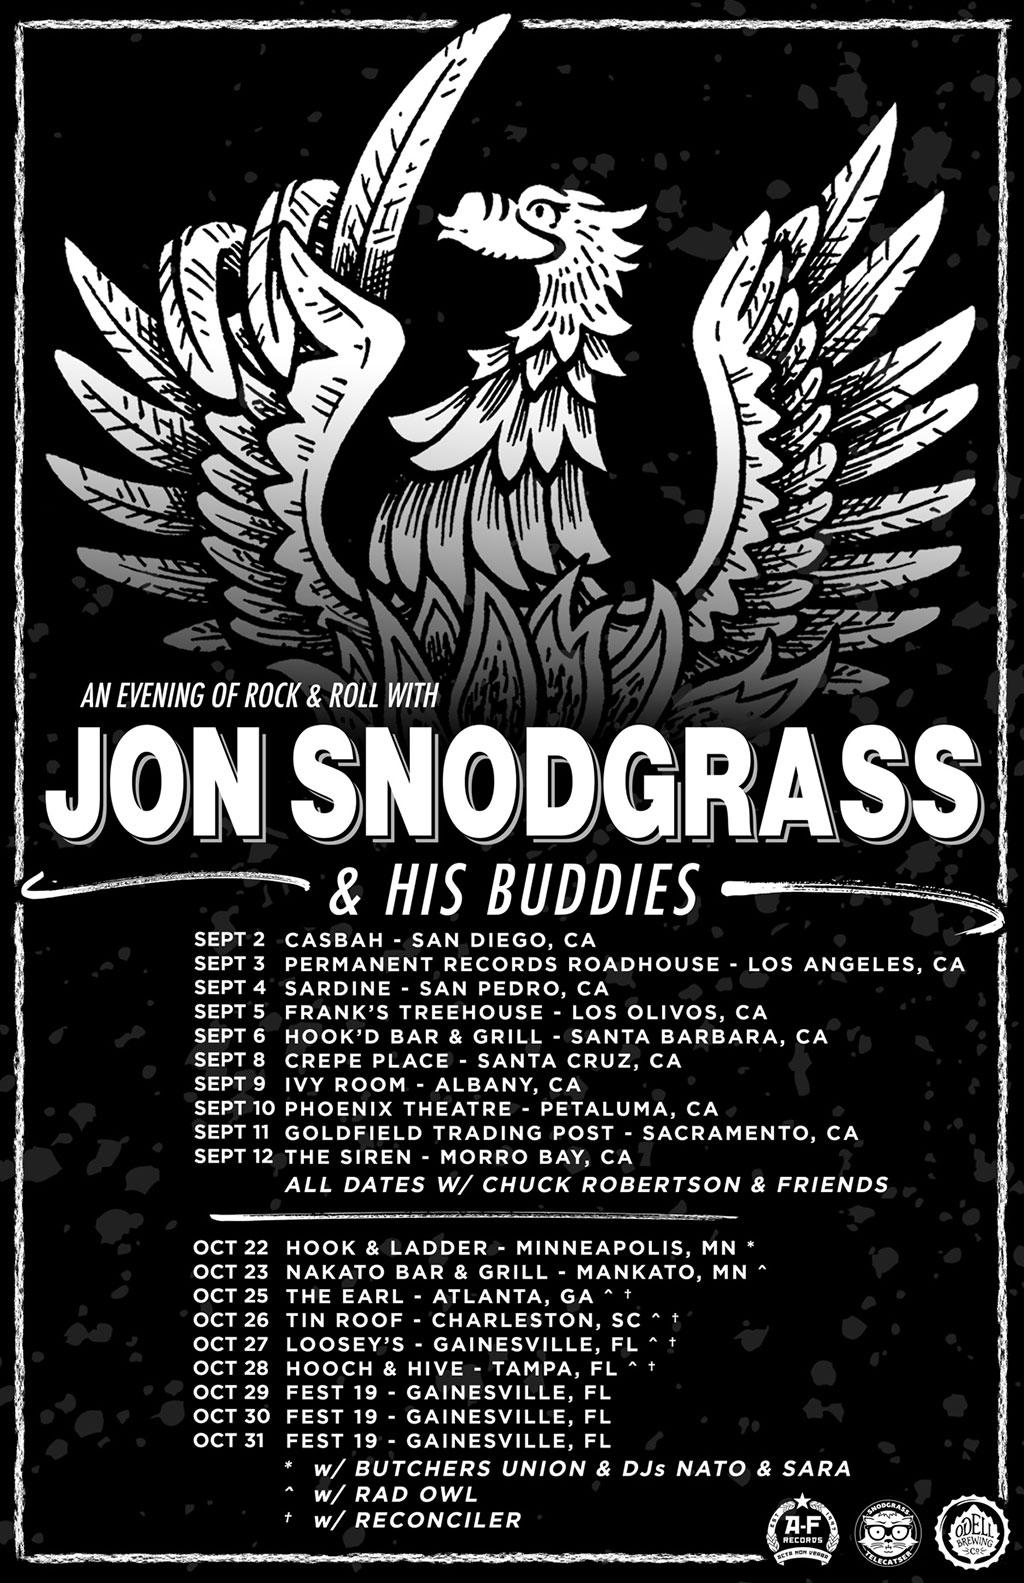 Jon Snodgrass & His Buddies - Fall Tour 2021